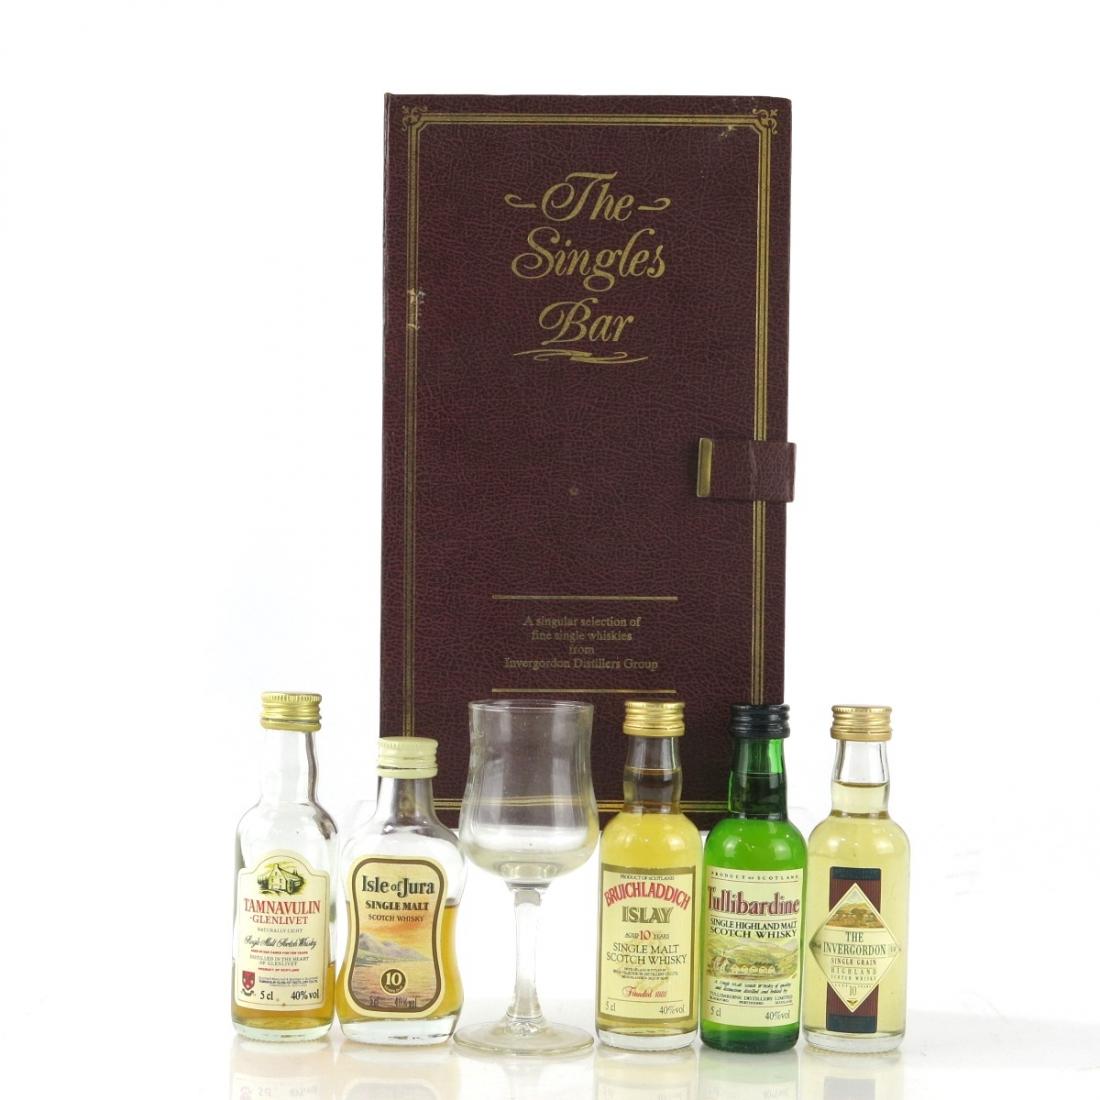 The Singles Bar Miniatures 5 x 5cl / Invergordon Distillers